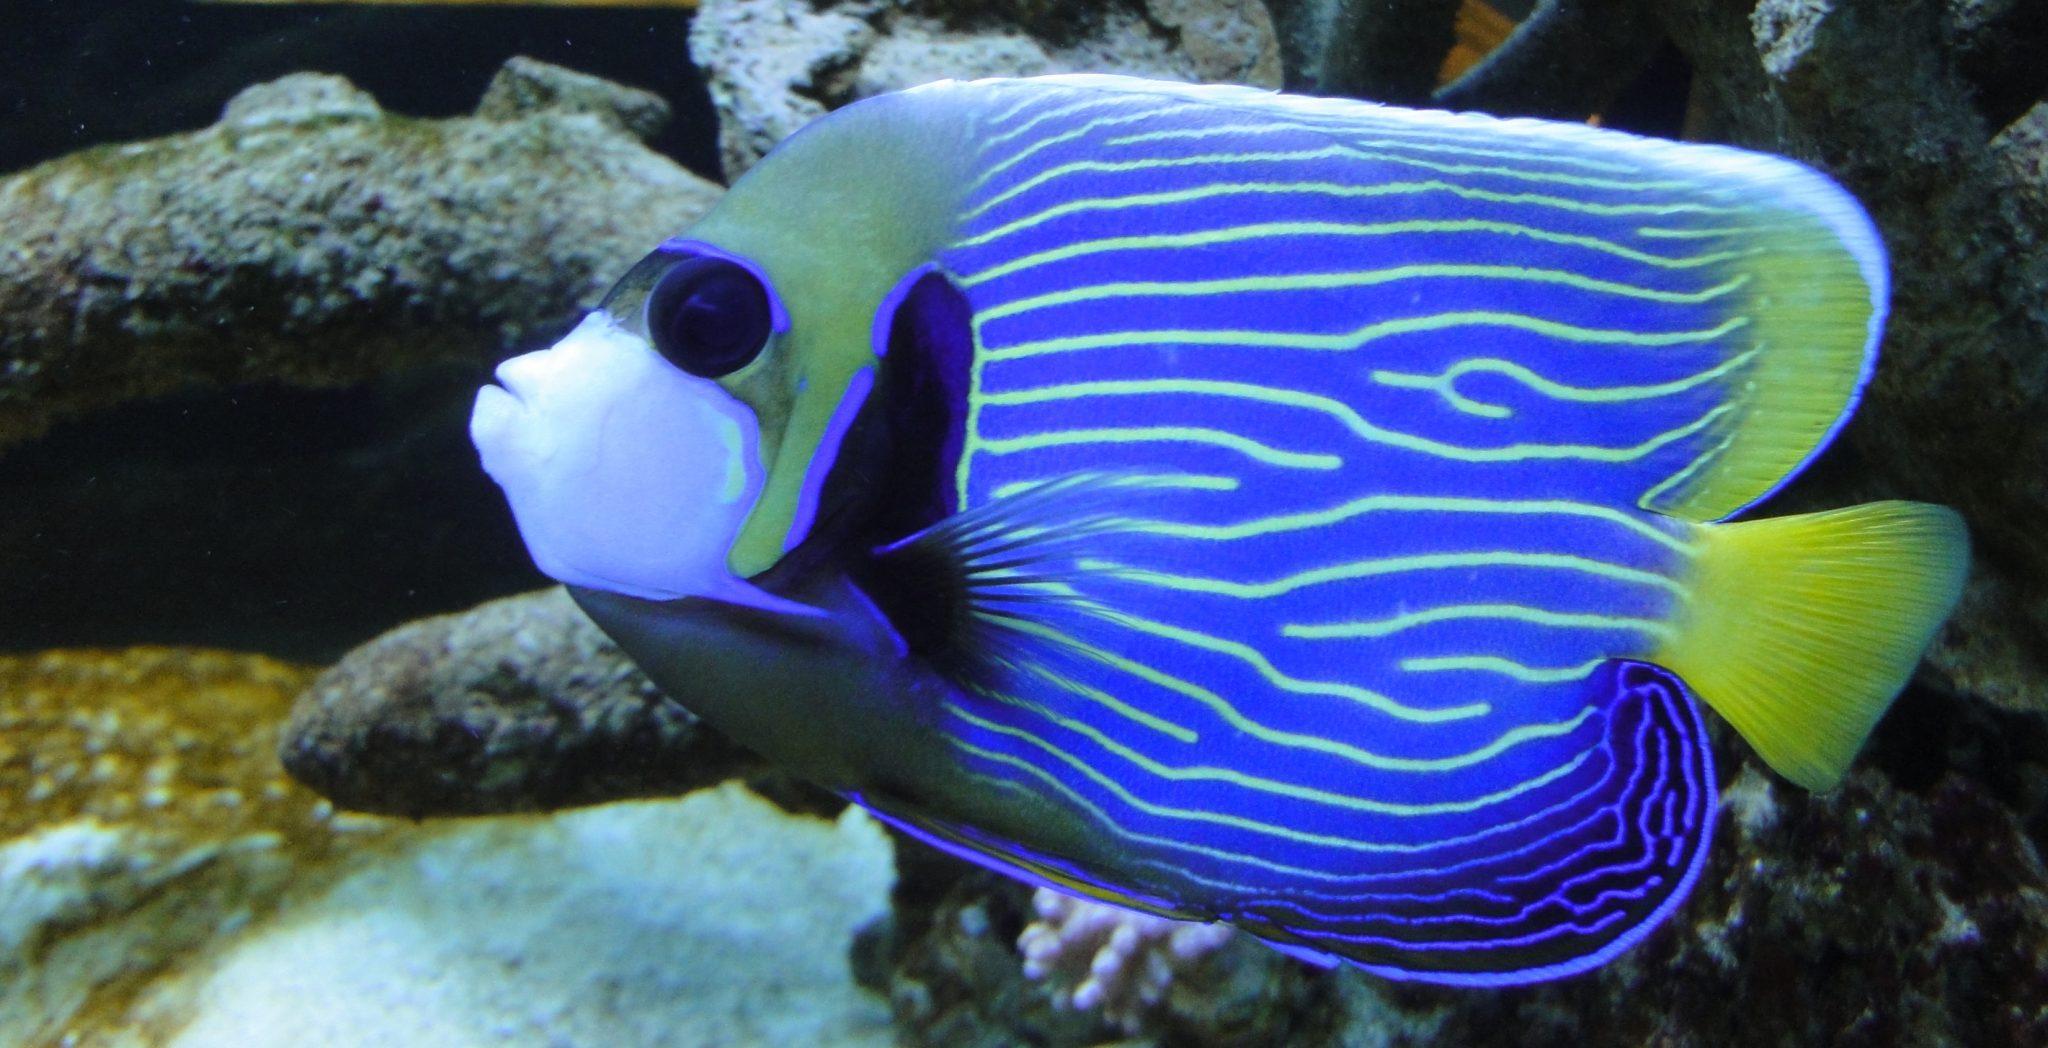 Pomacanthus imperator, Emperor Angelfish, Angelfish, Emperor, Imperial Angelfish